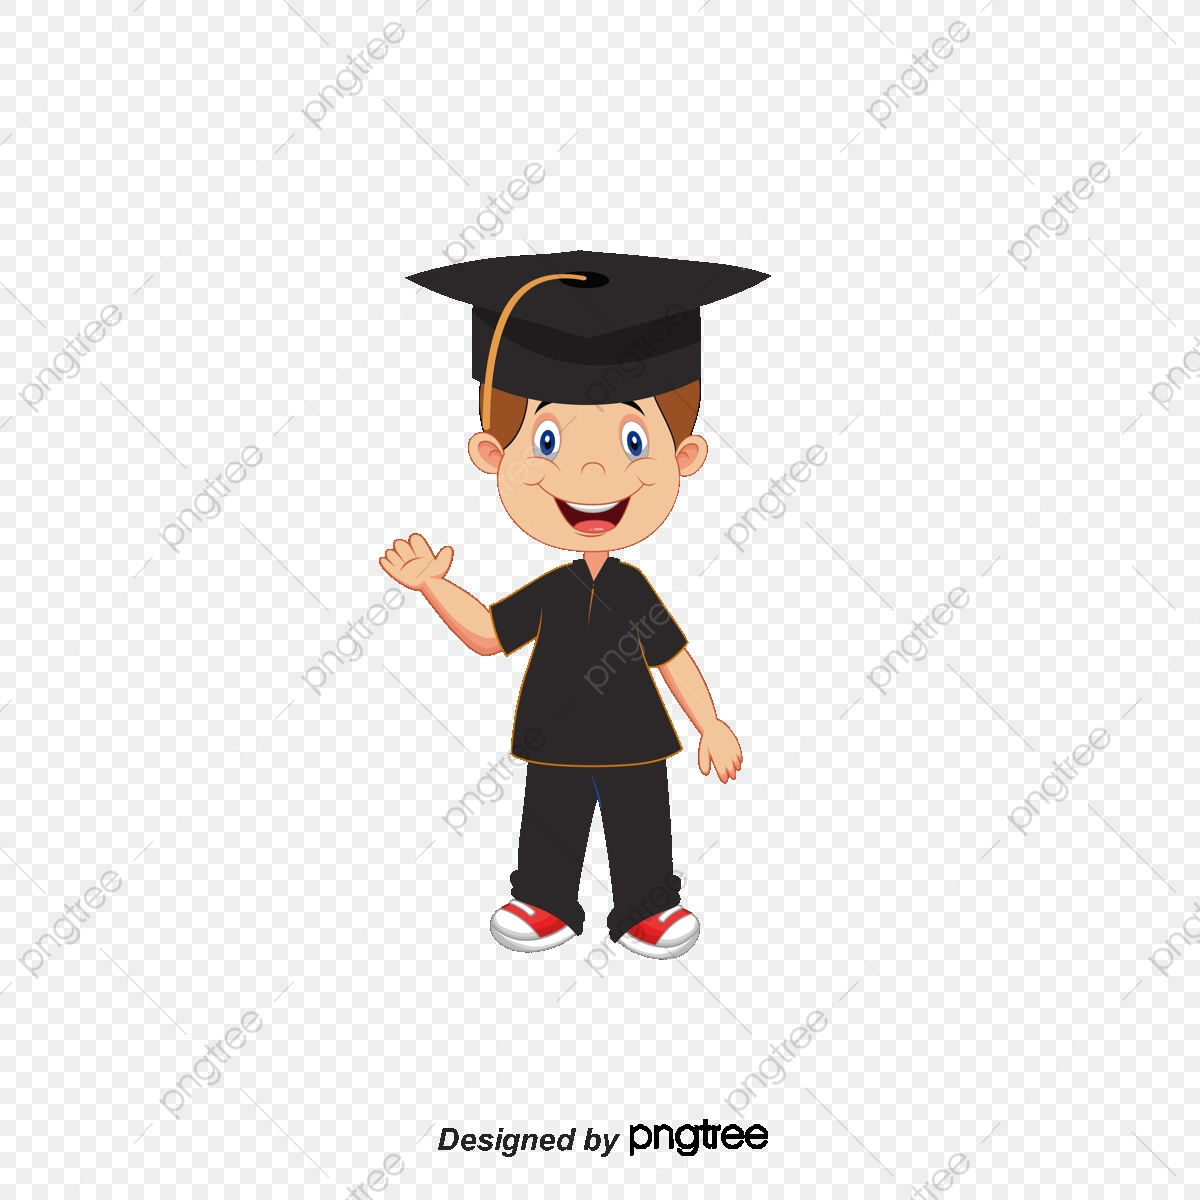 jpg royalty free download Graduate clipart . Student vector design.